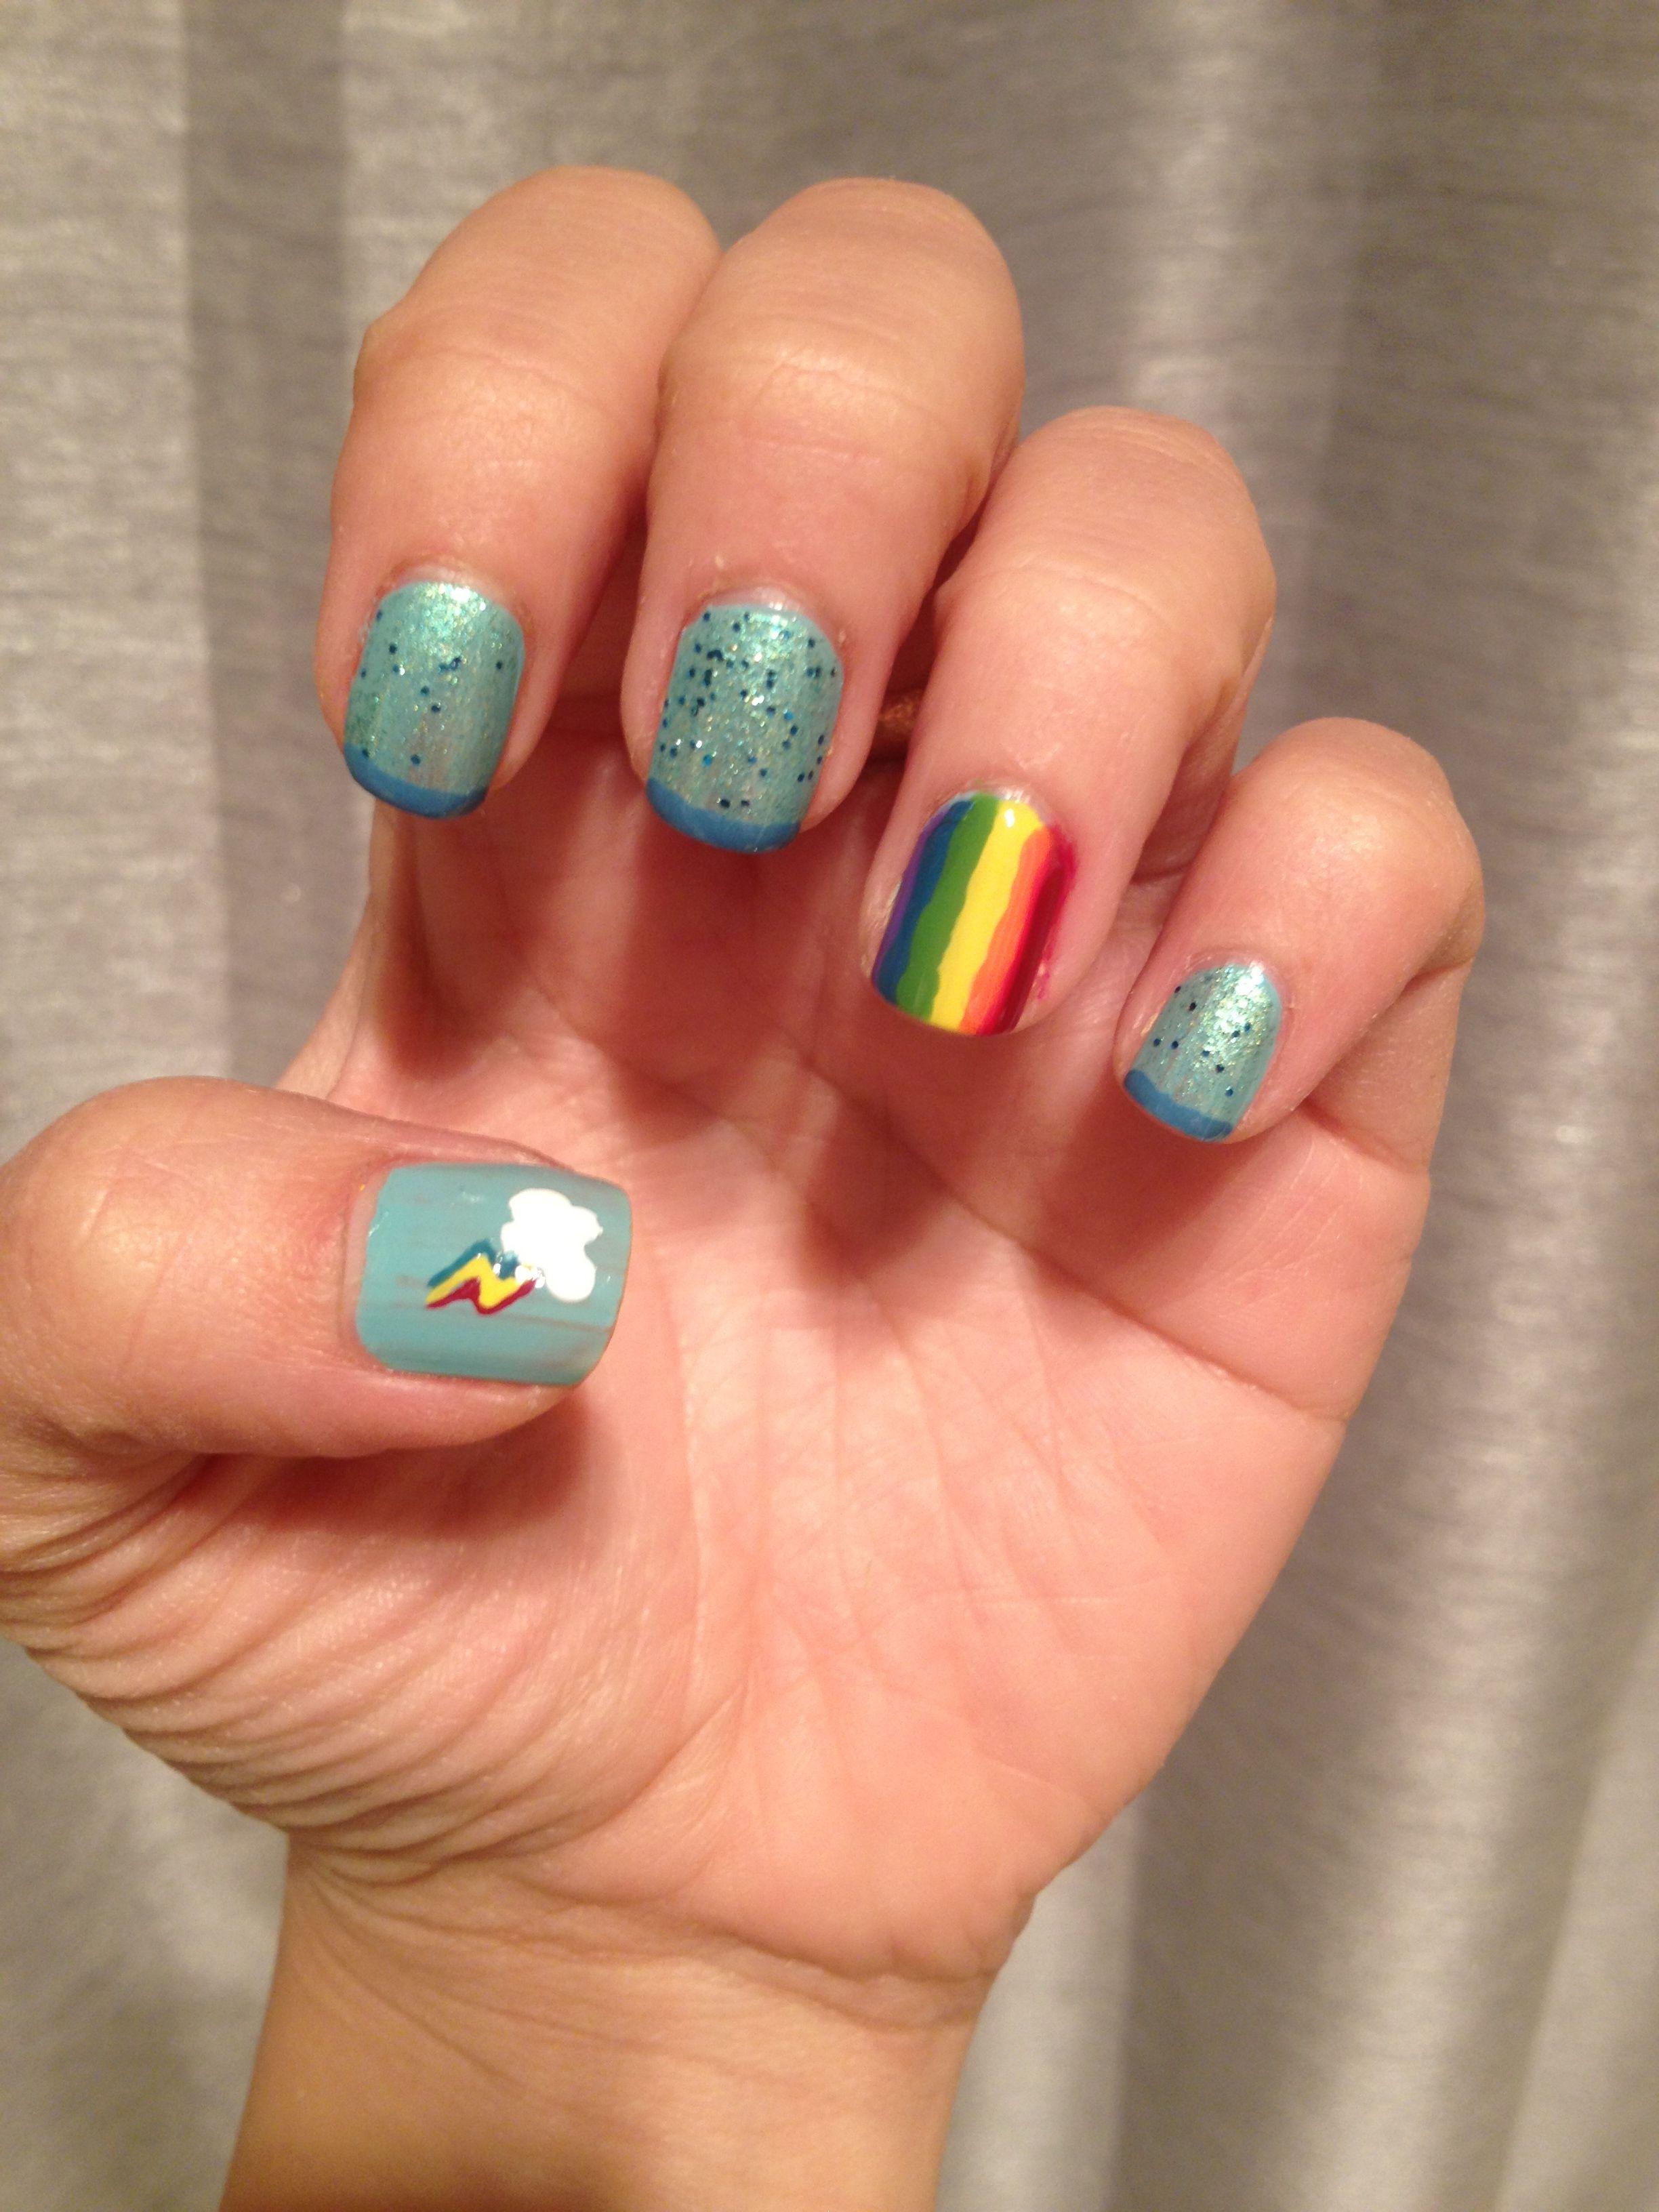 Mlp rainbow dash nail art   My nails   Pinterest